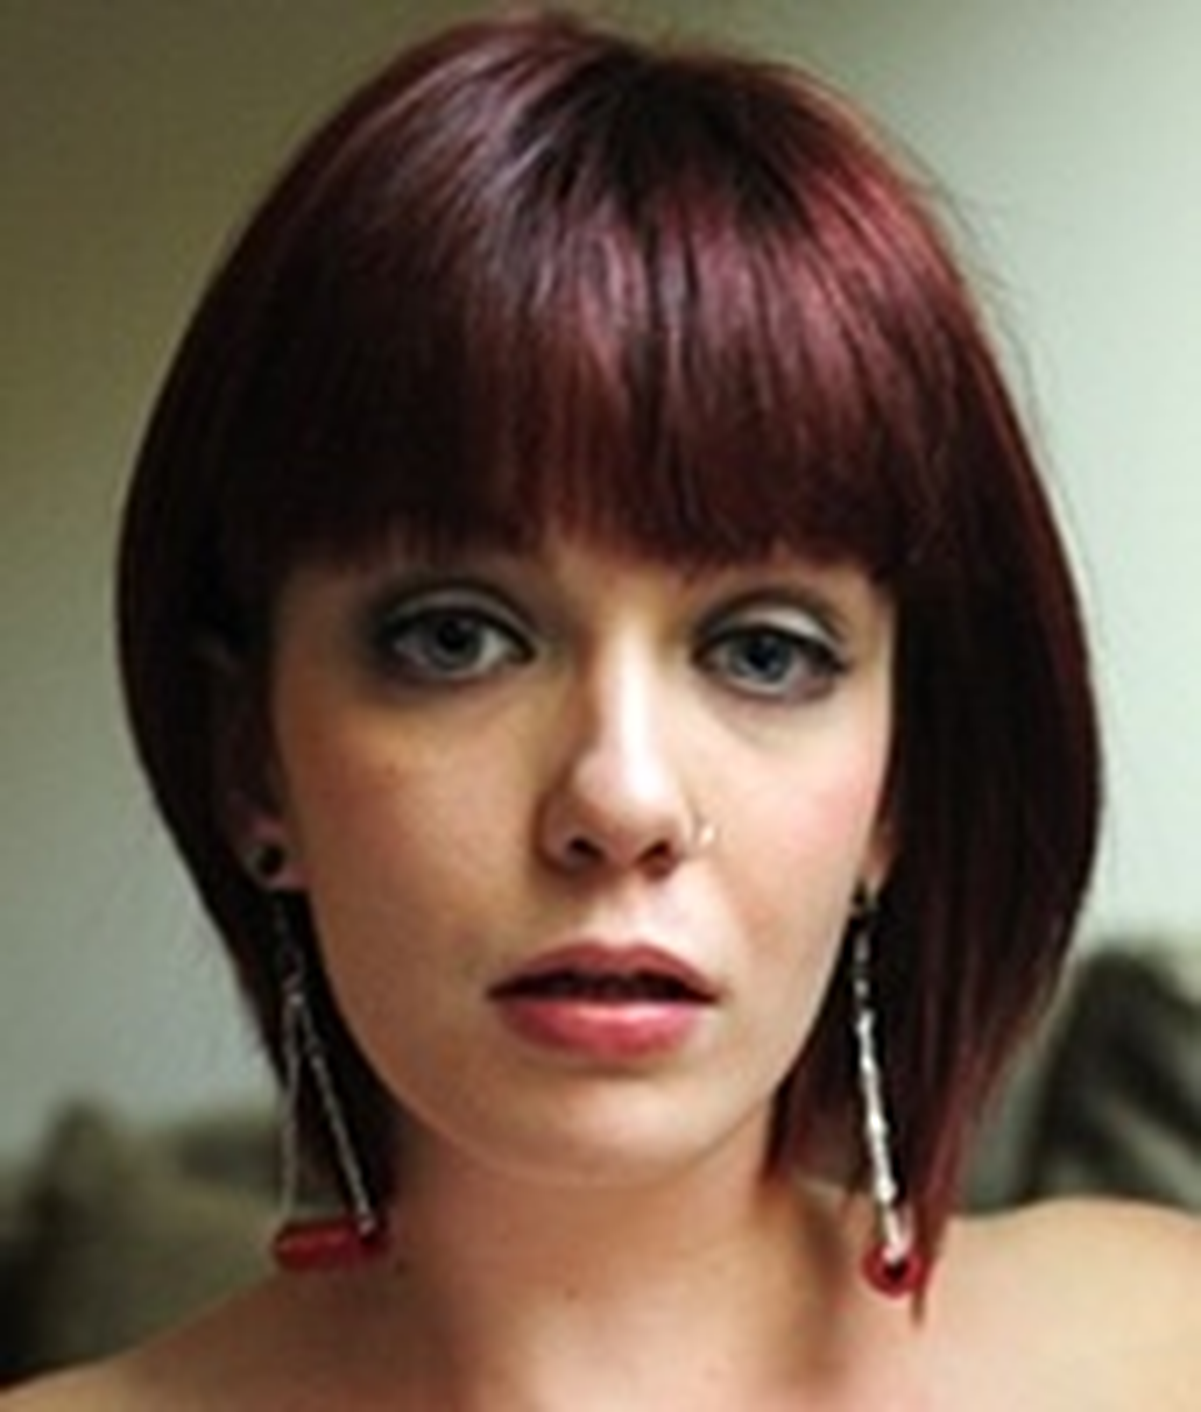 Sidney Scarlet